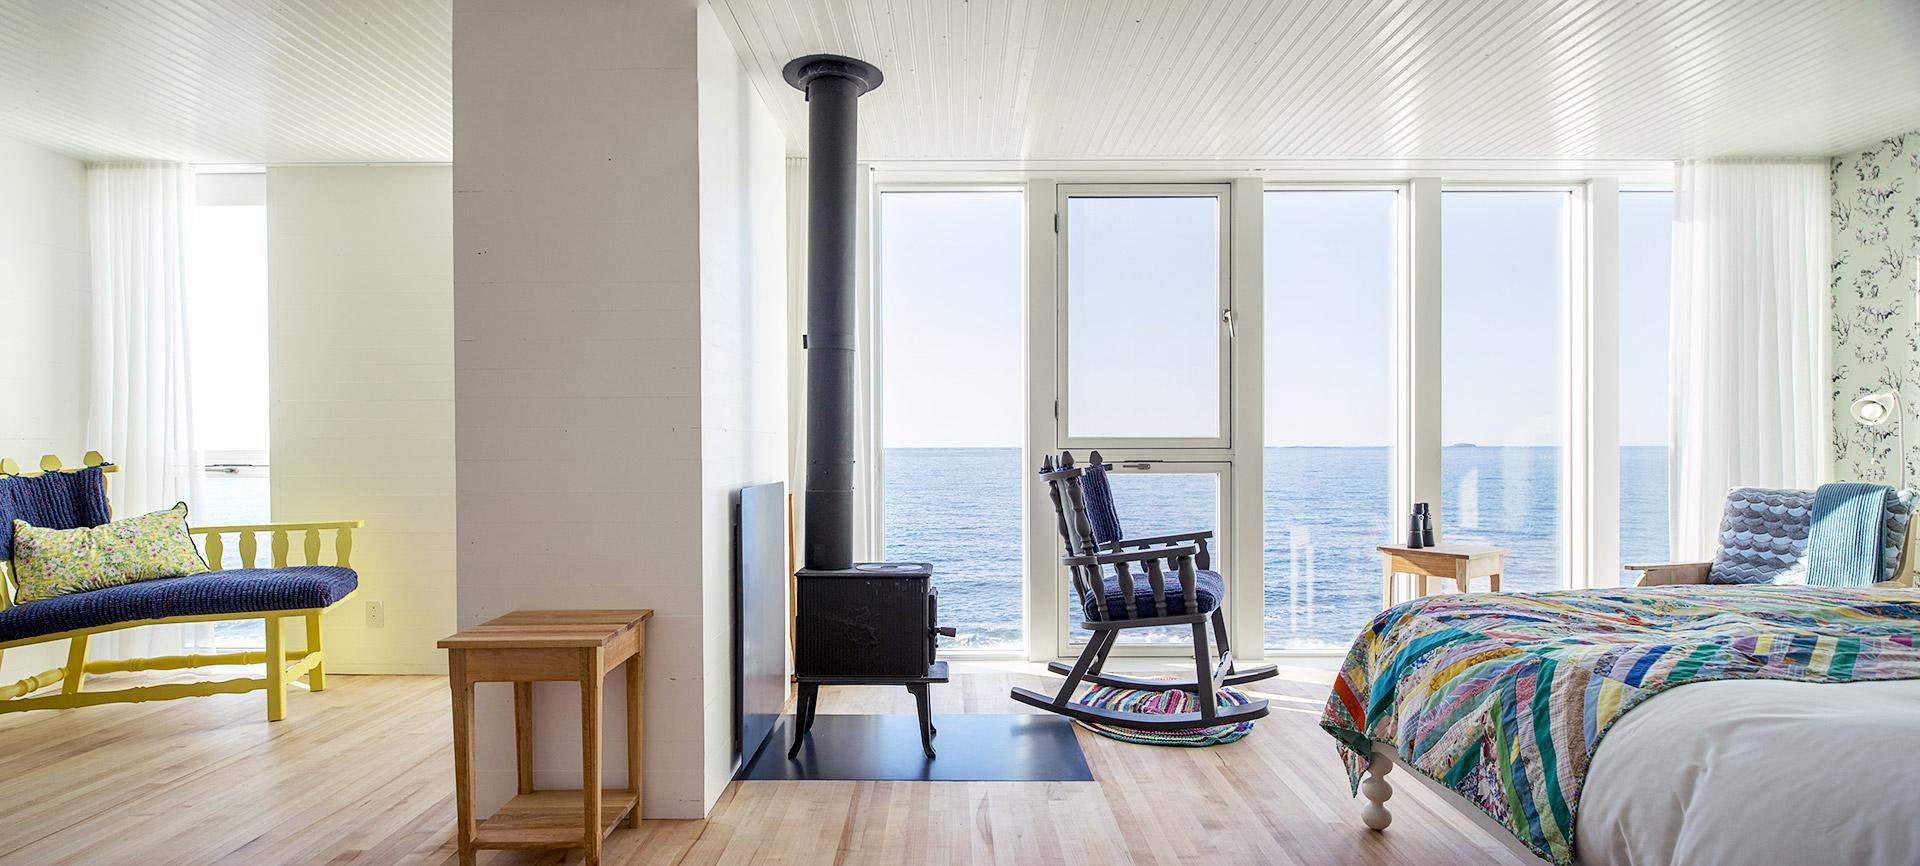 Fogo Island Inn's suite